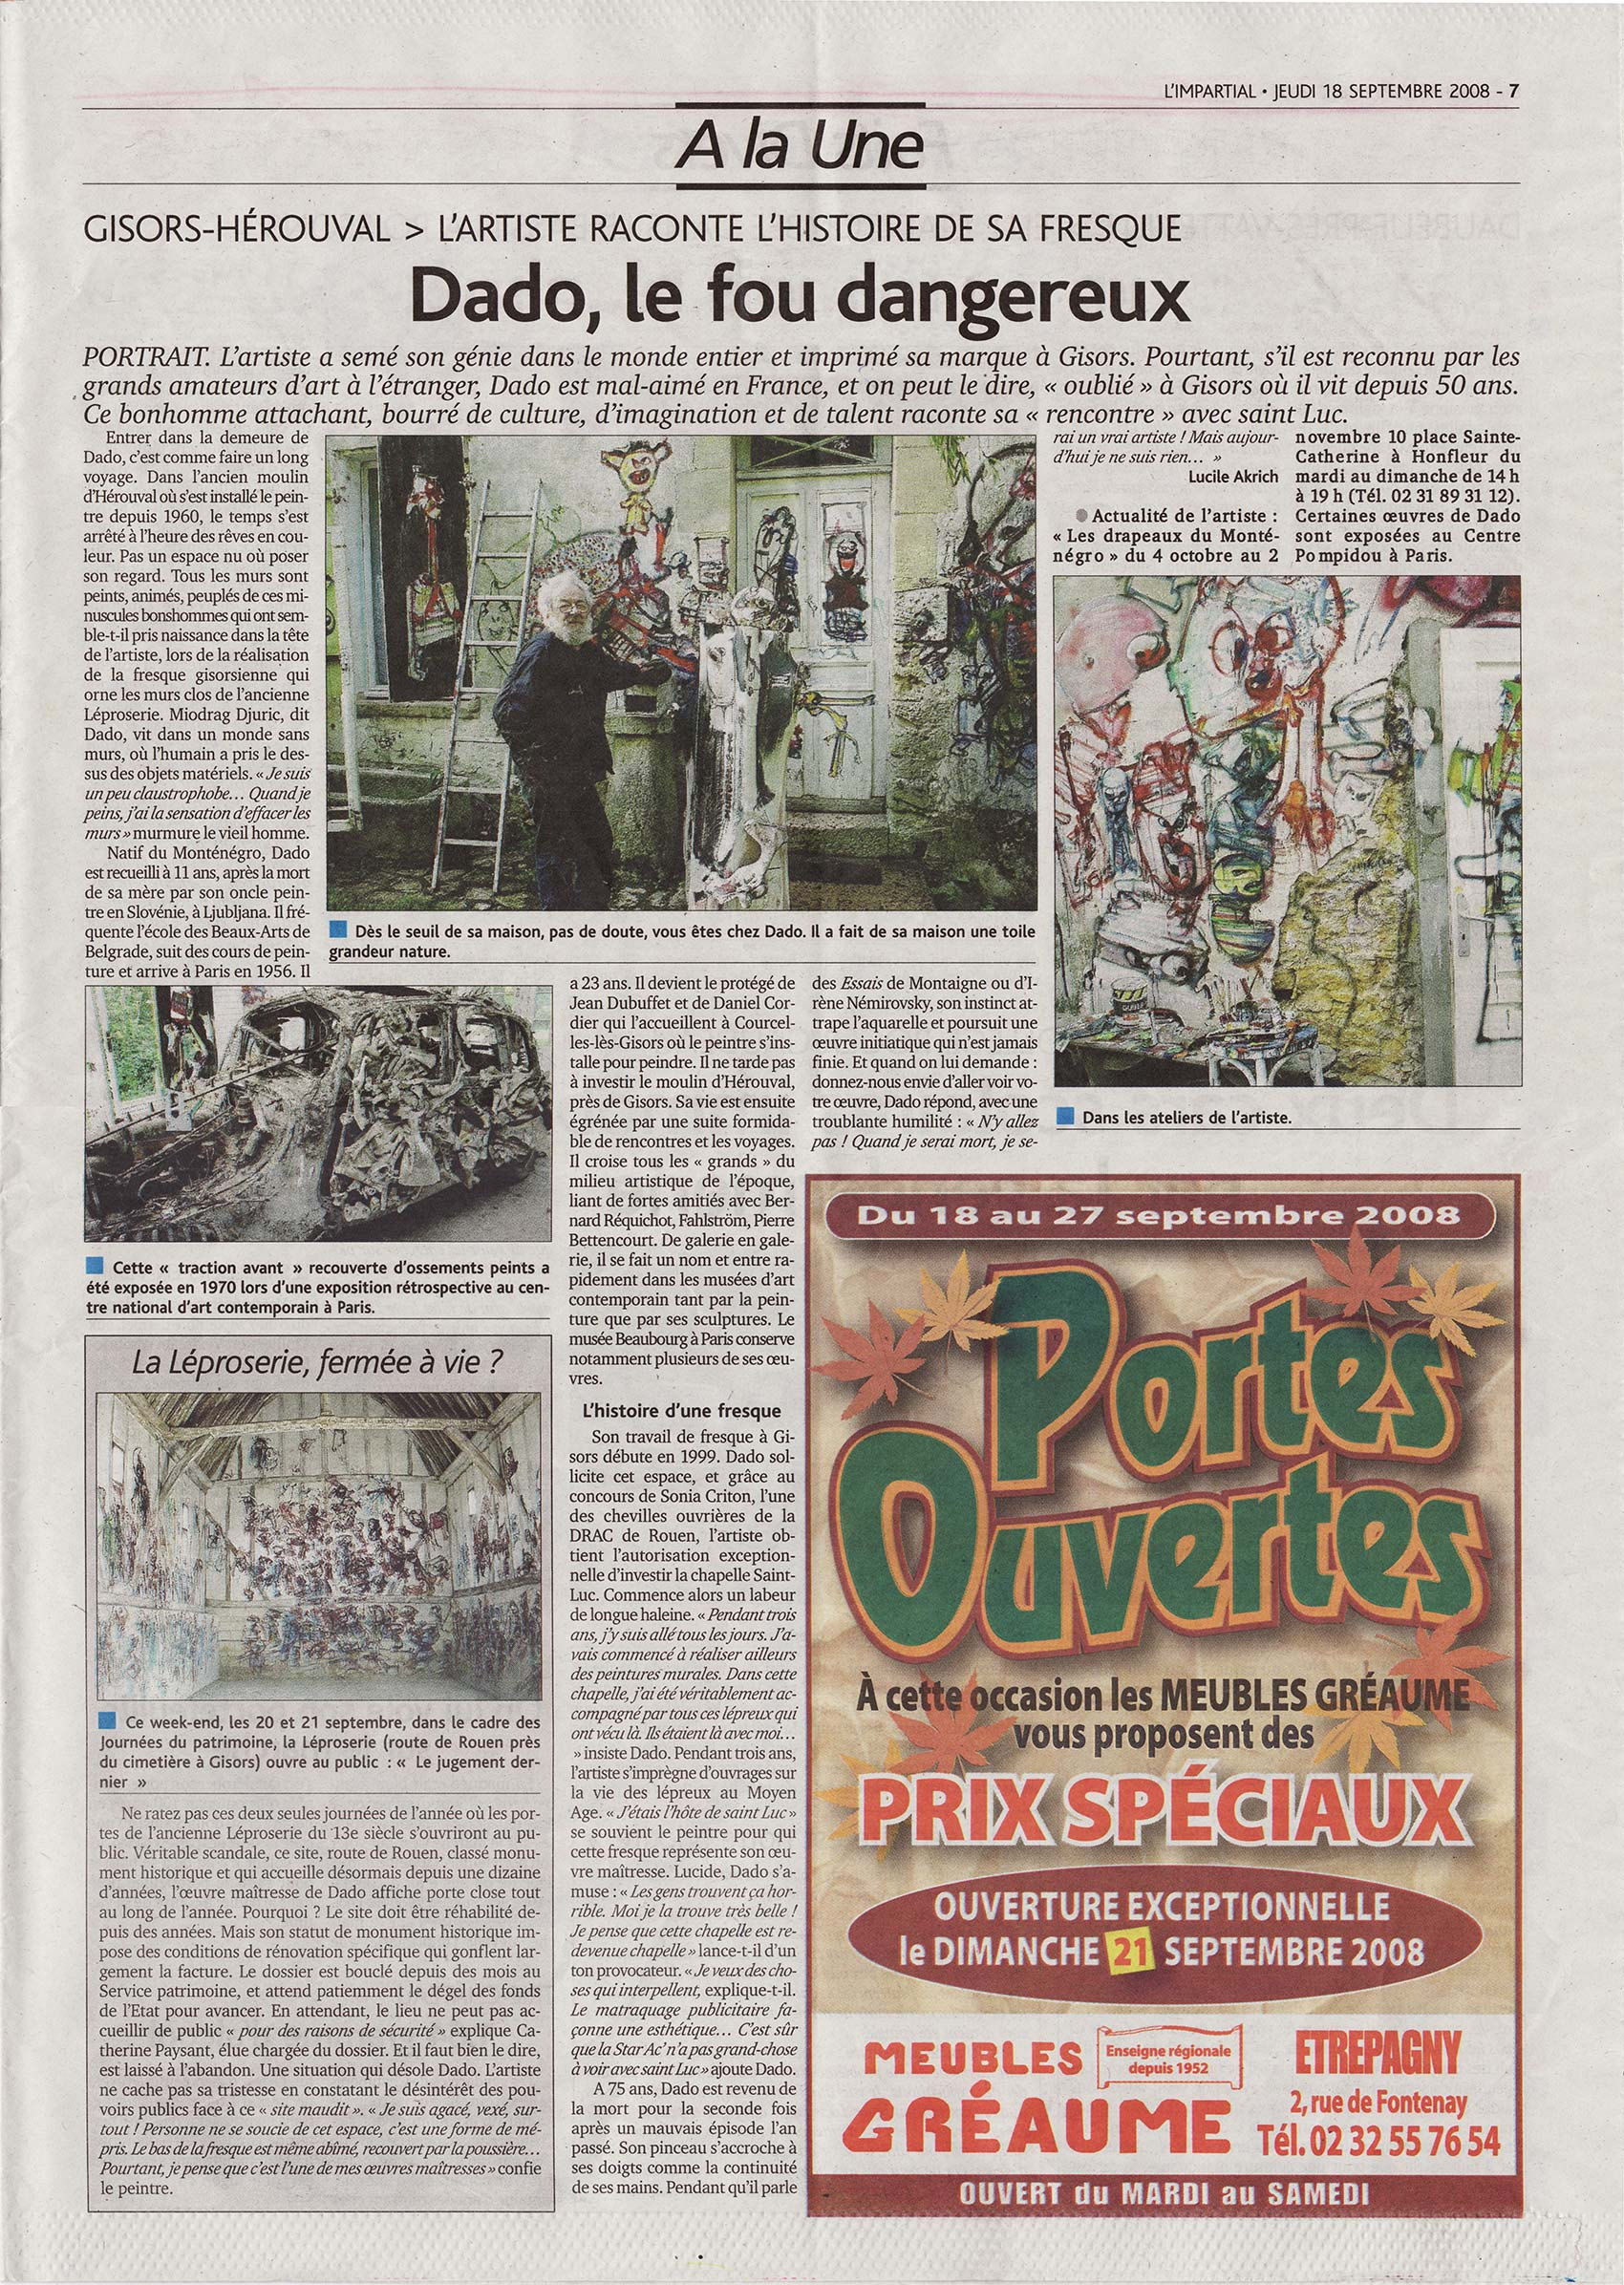 Članak iz žurnala l'Impartial od četvrtka 18. septembra 2008. godine o slikaru dadu.